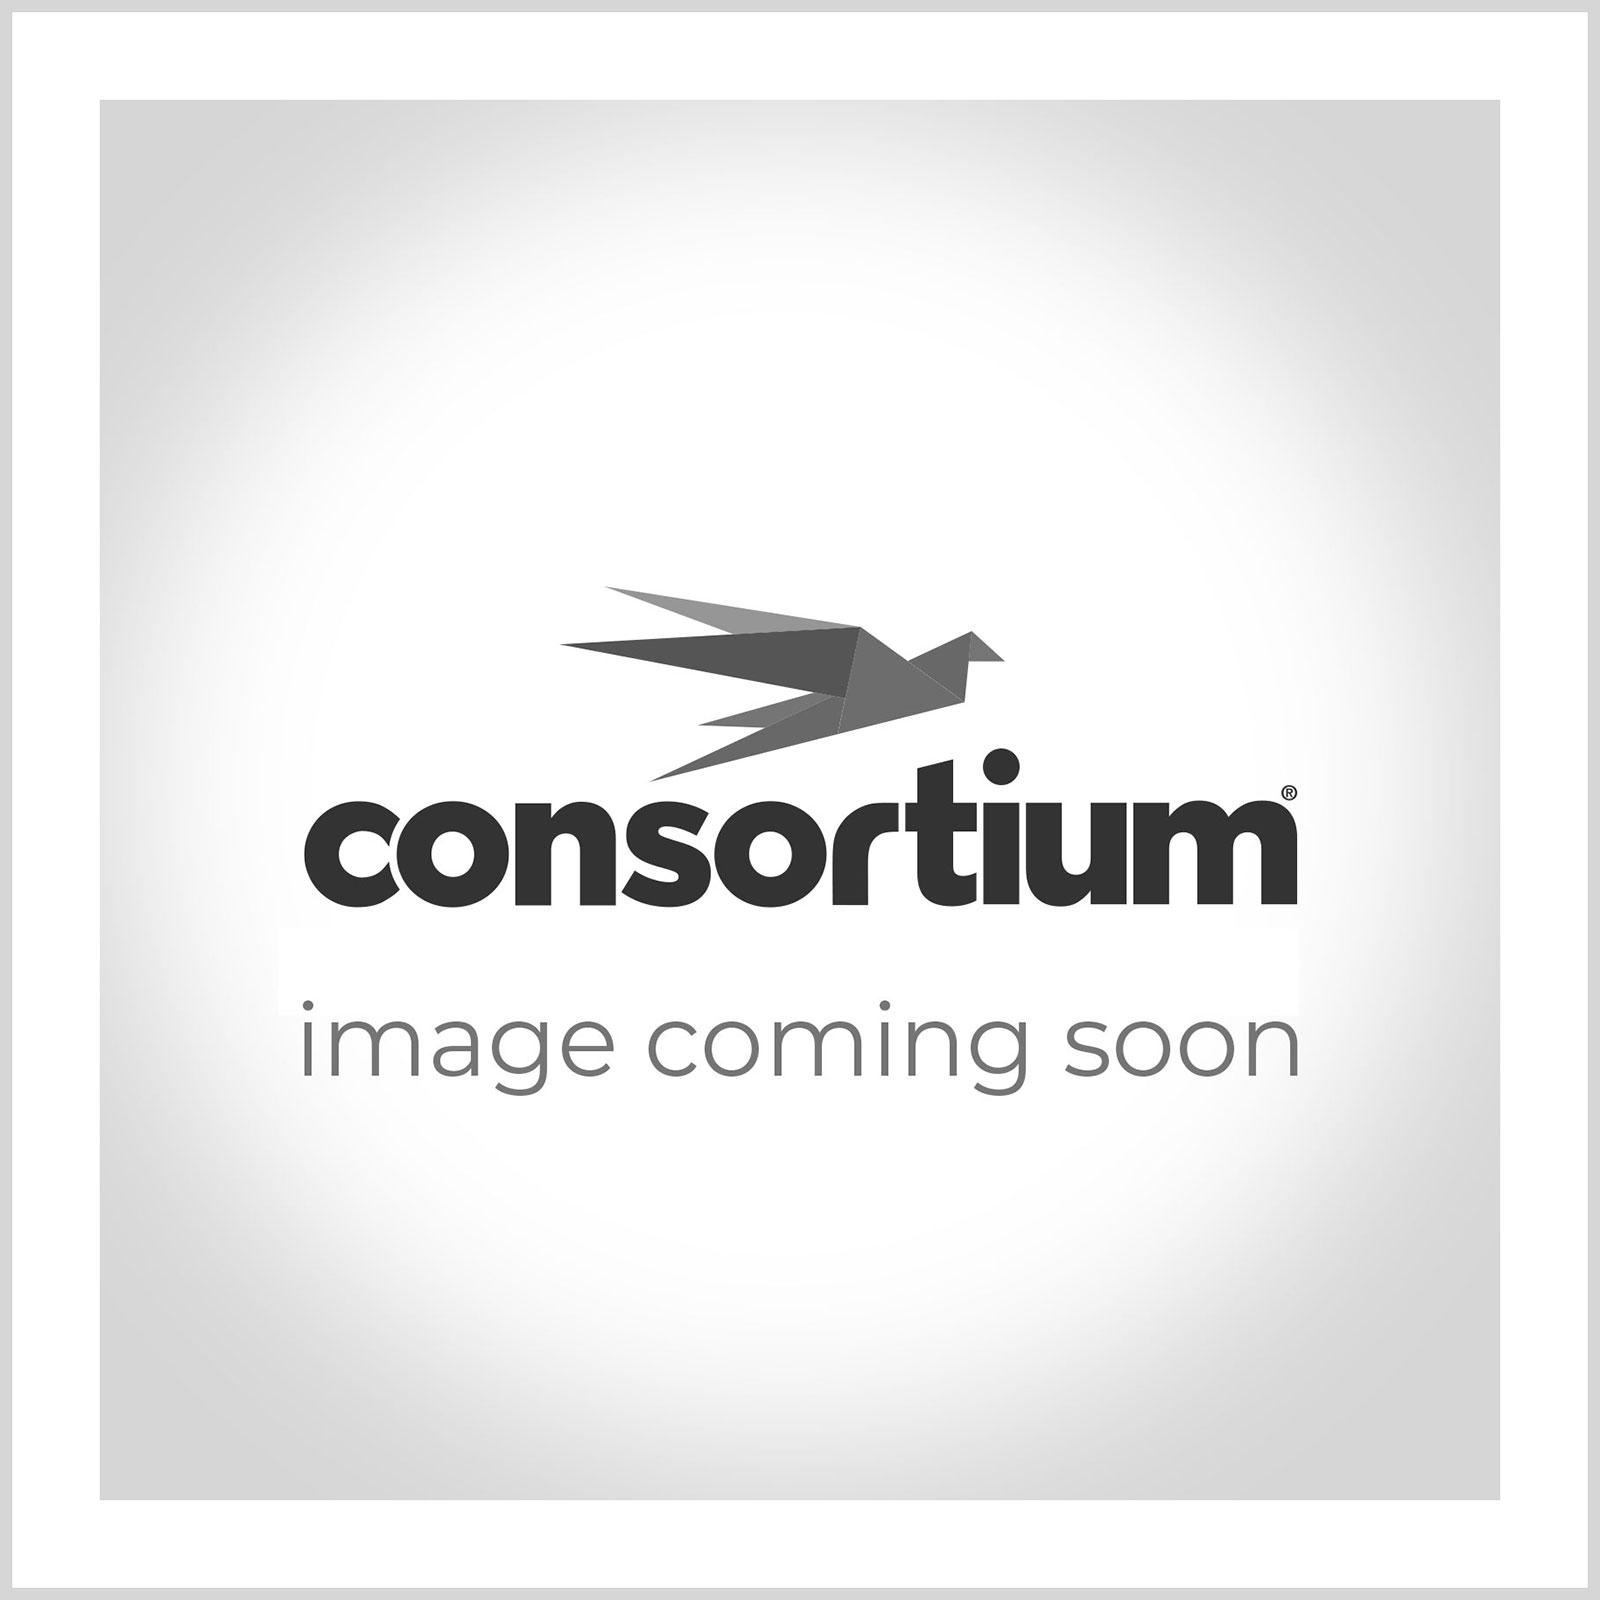 Twin Wheel Scooter